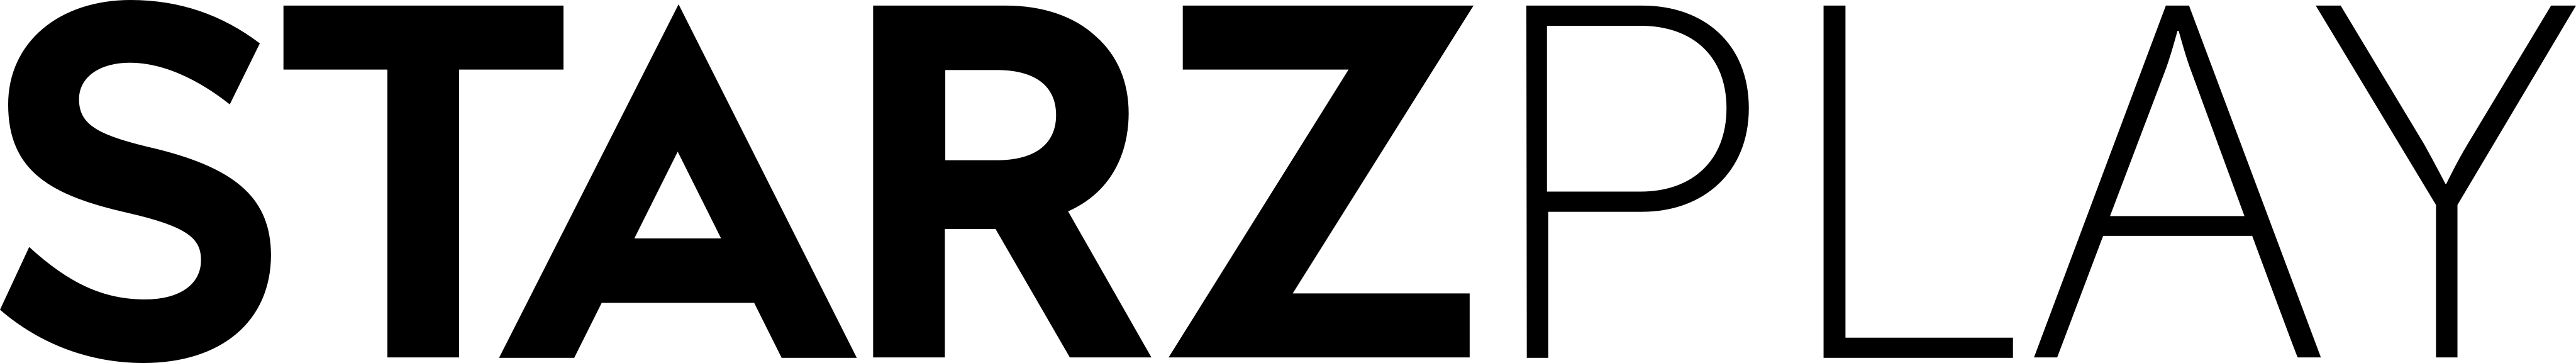 starzplay logo - STARZPLAY Logo